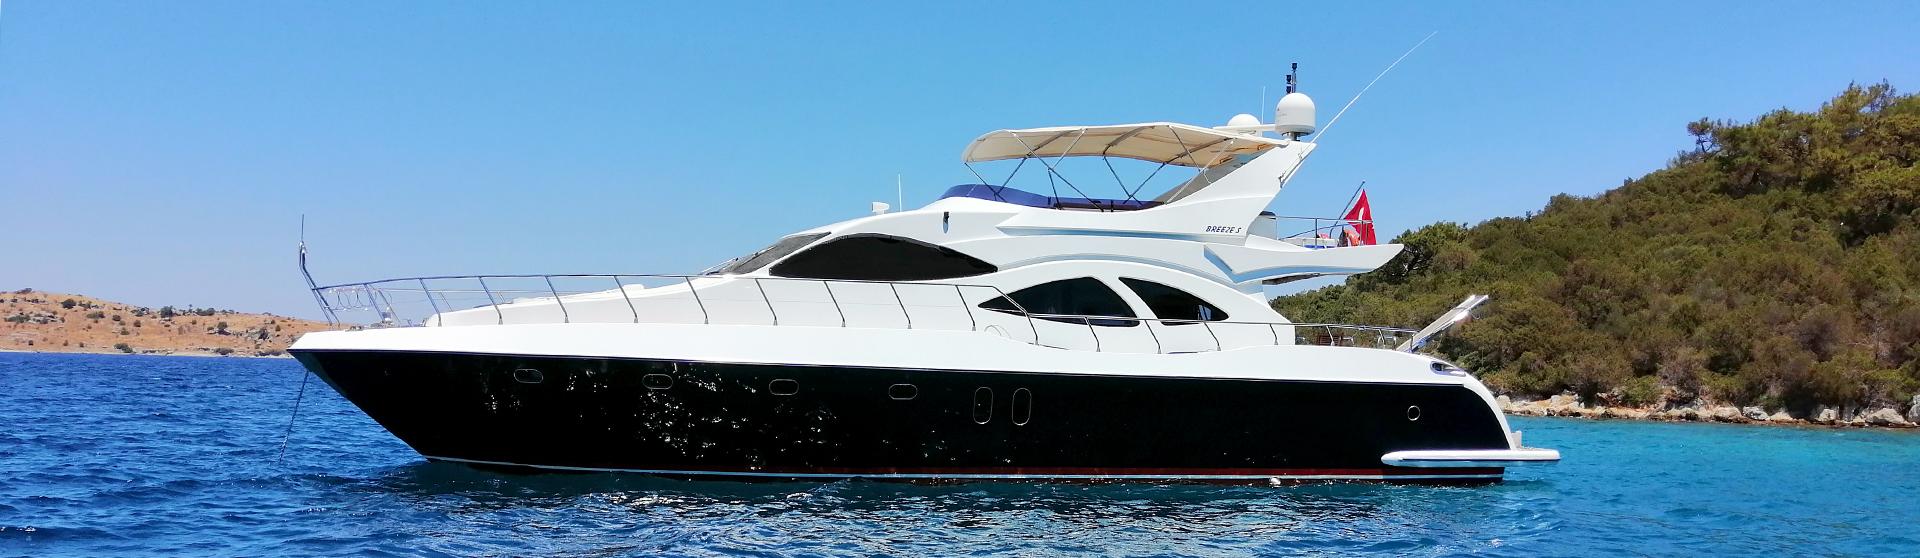 Breeze-S Motoryacht